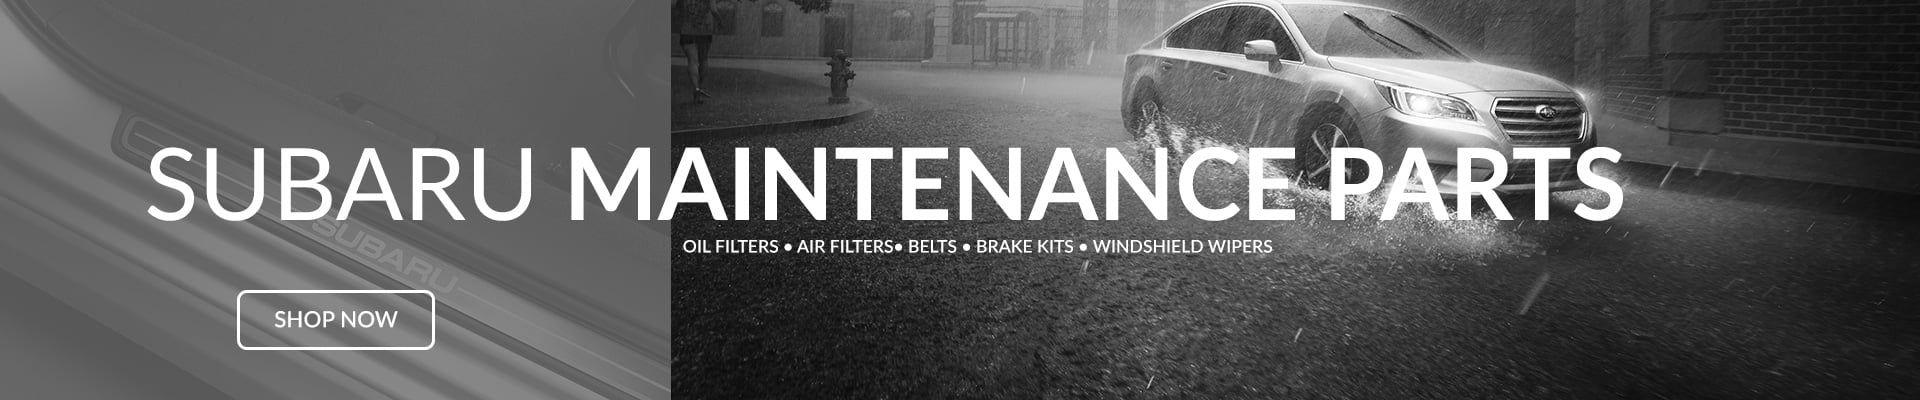 Subaru Maintenance Parts